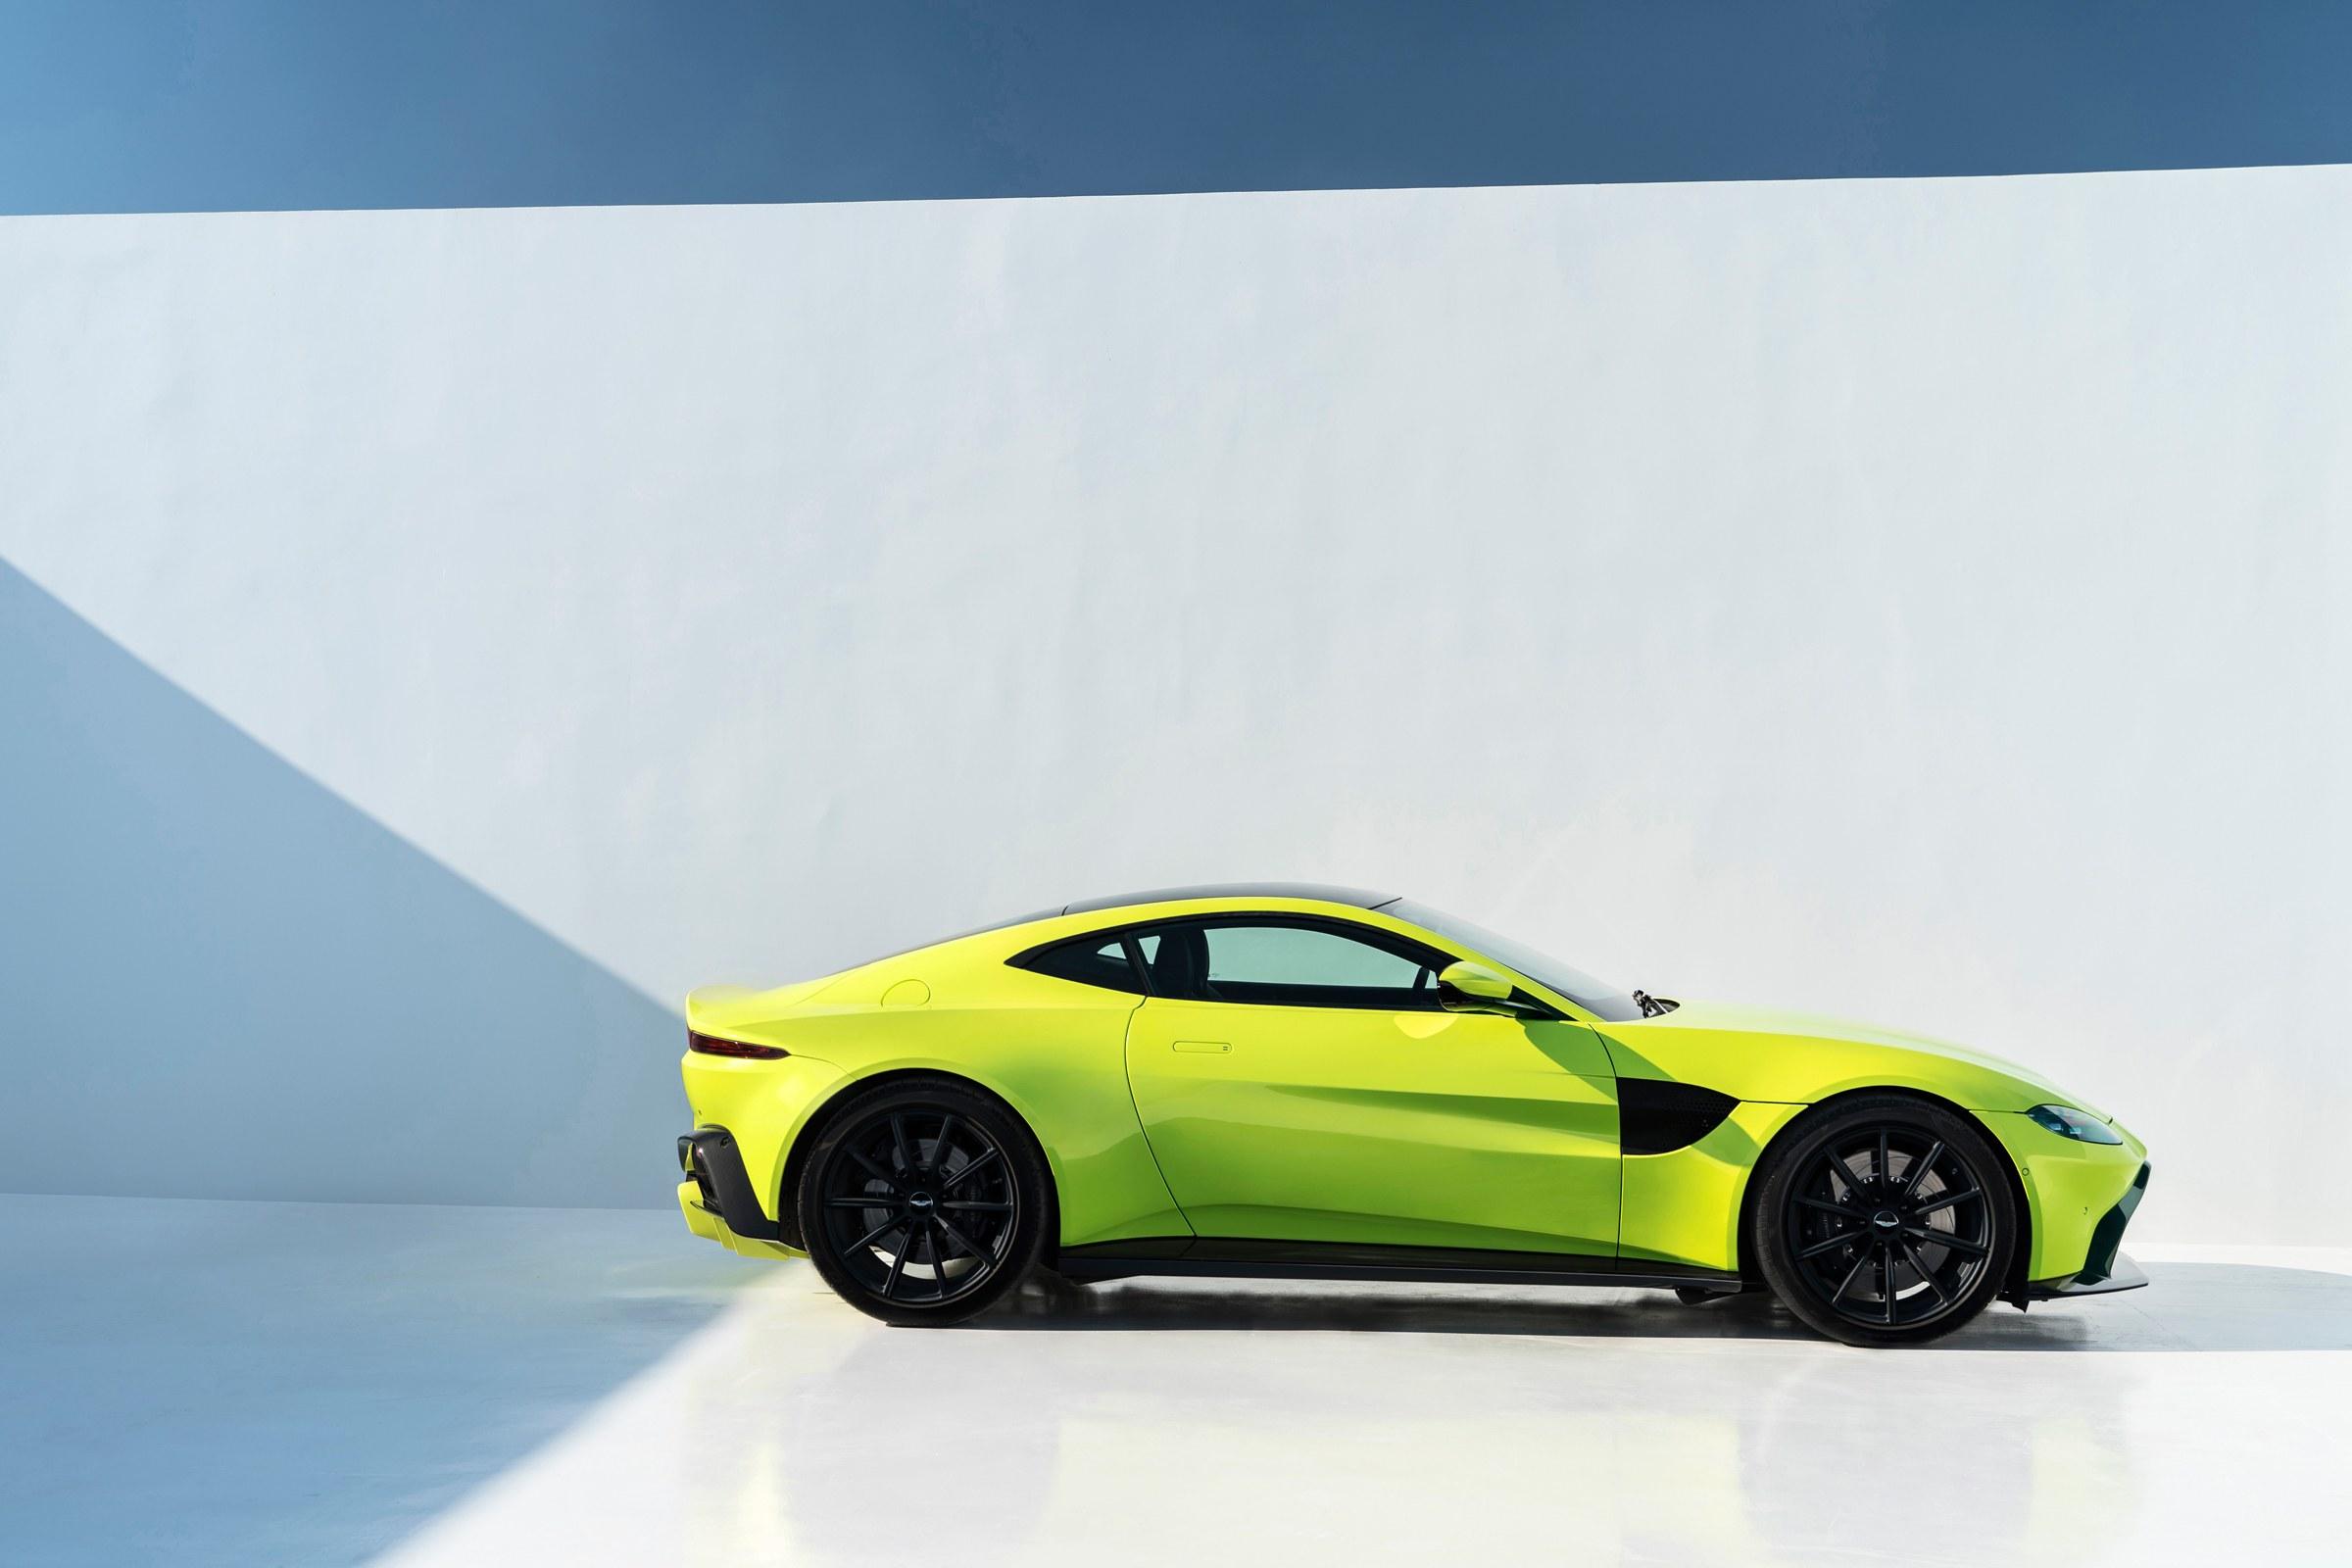 Aston Martin Unveils Its New, $150,000 Vantage Sports Car | WIRED